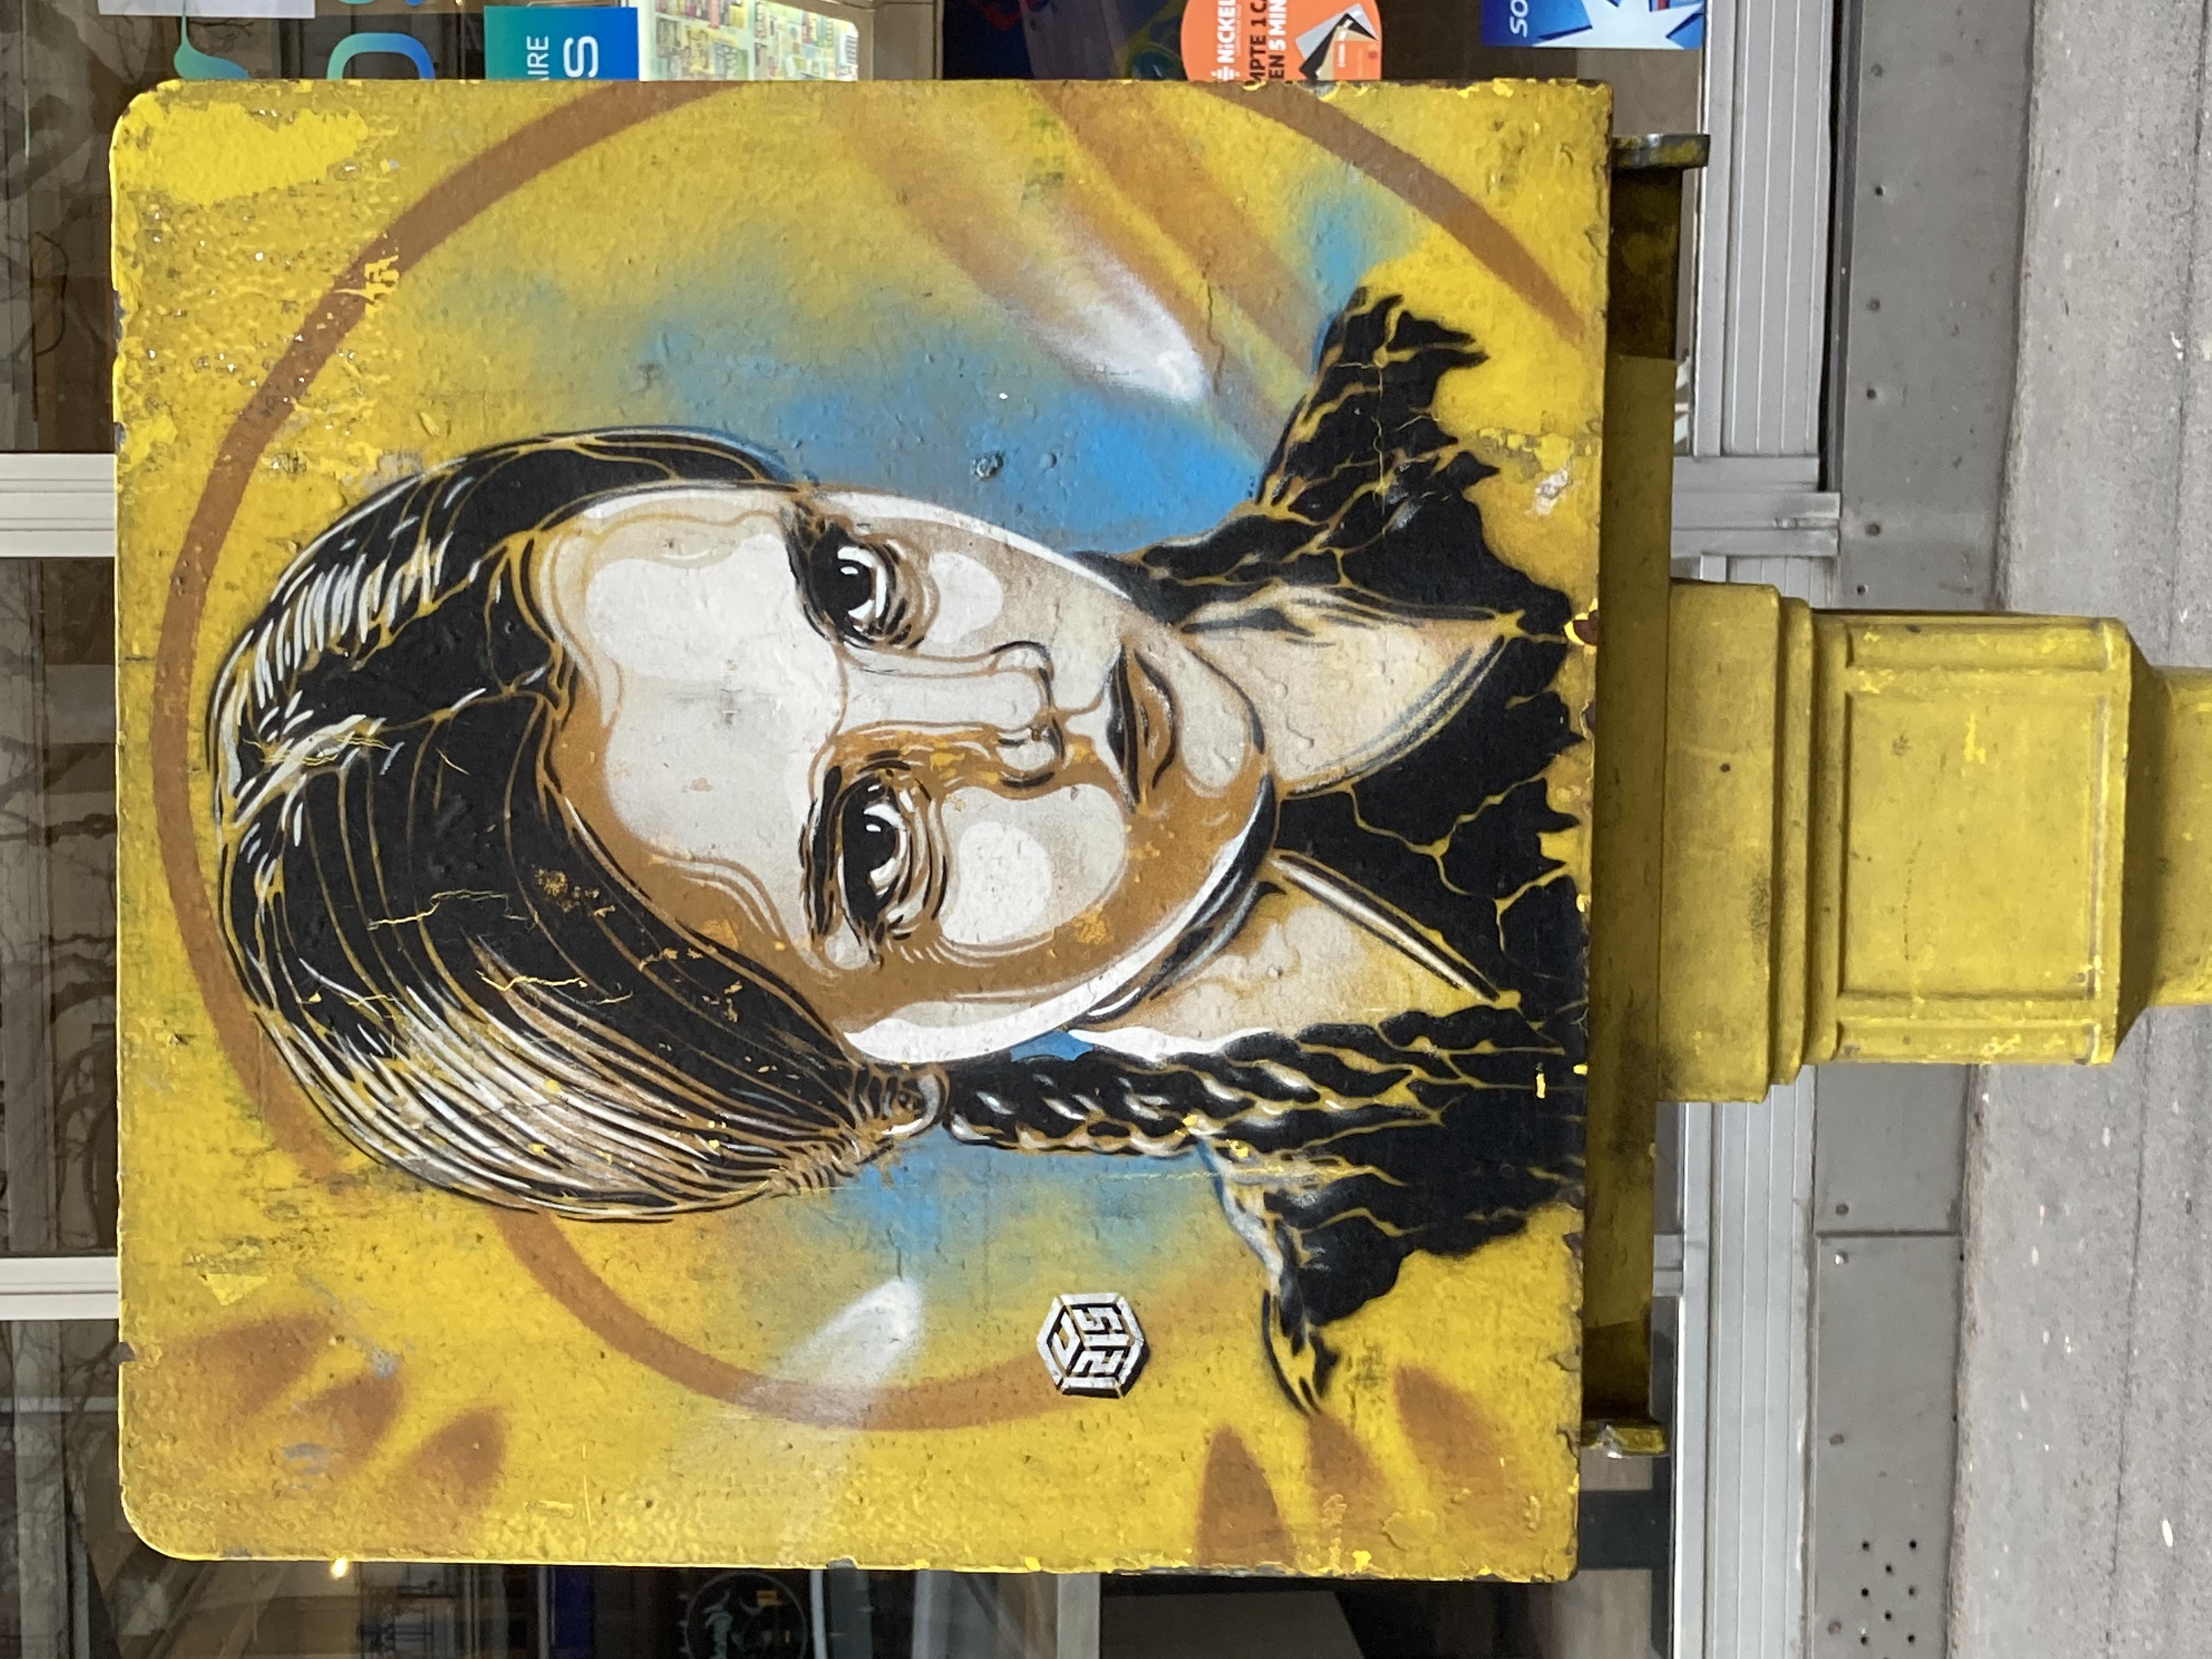 portrait de Mercredi Addams